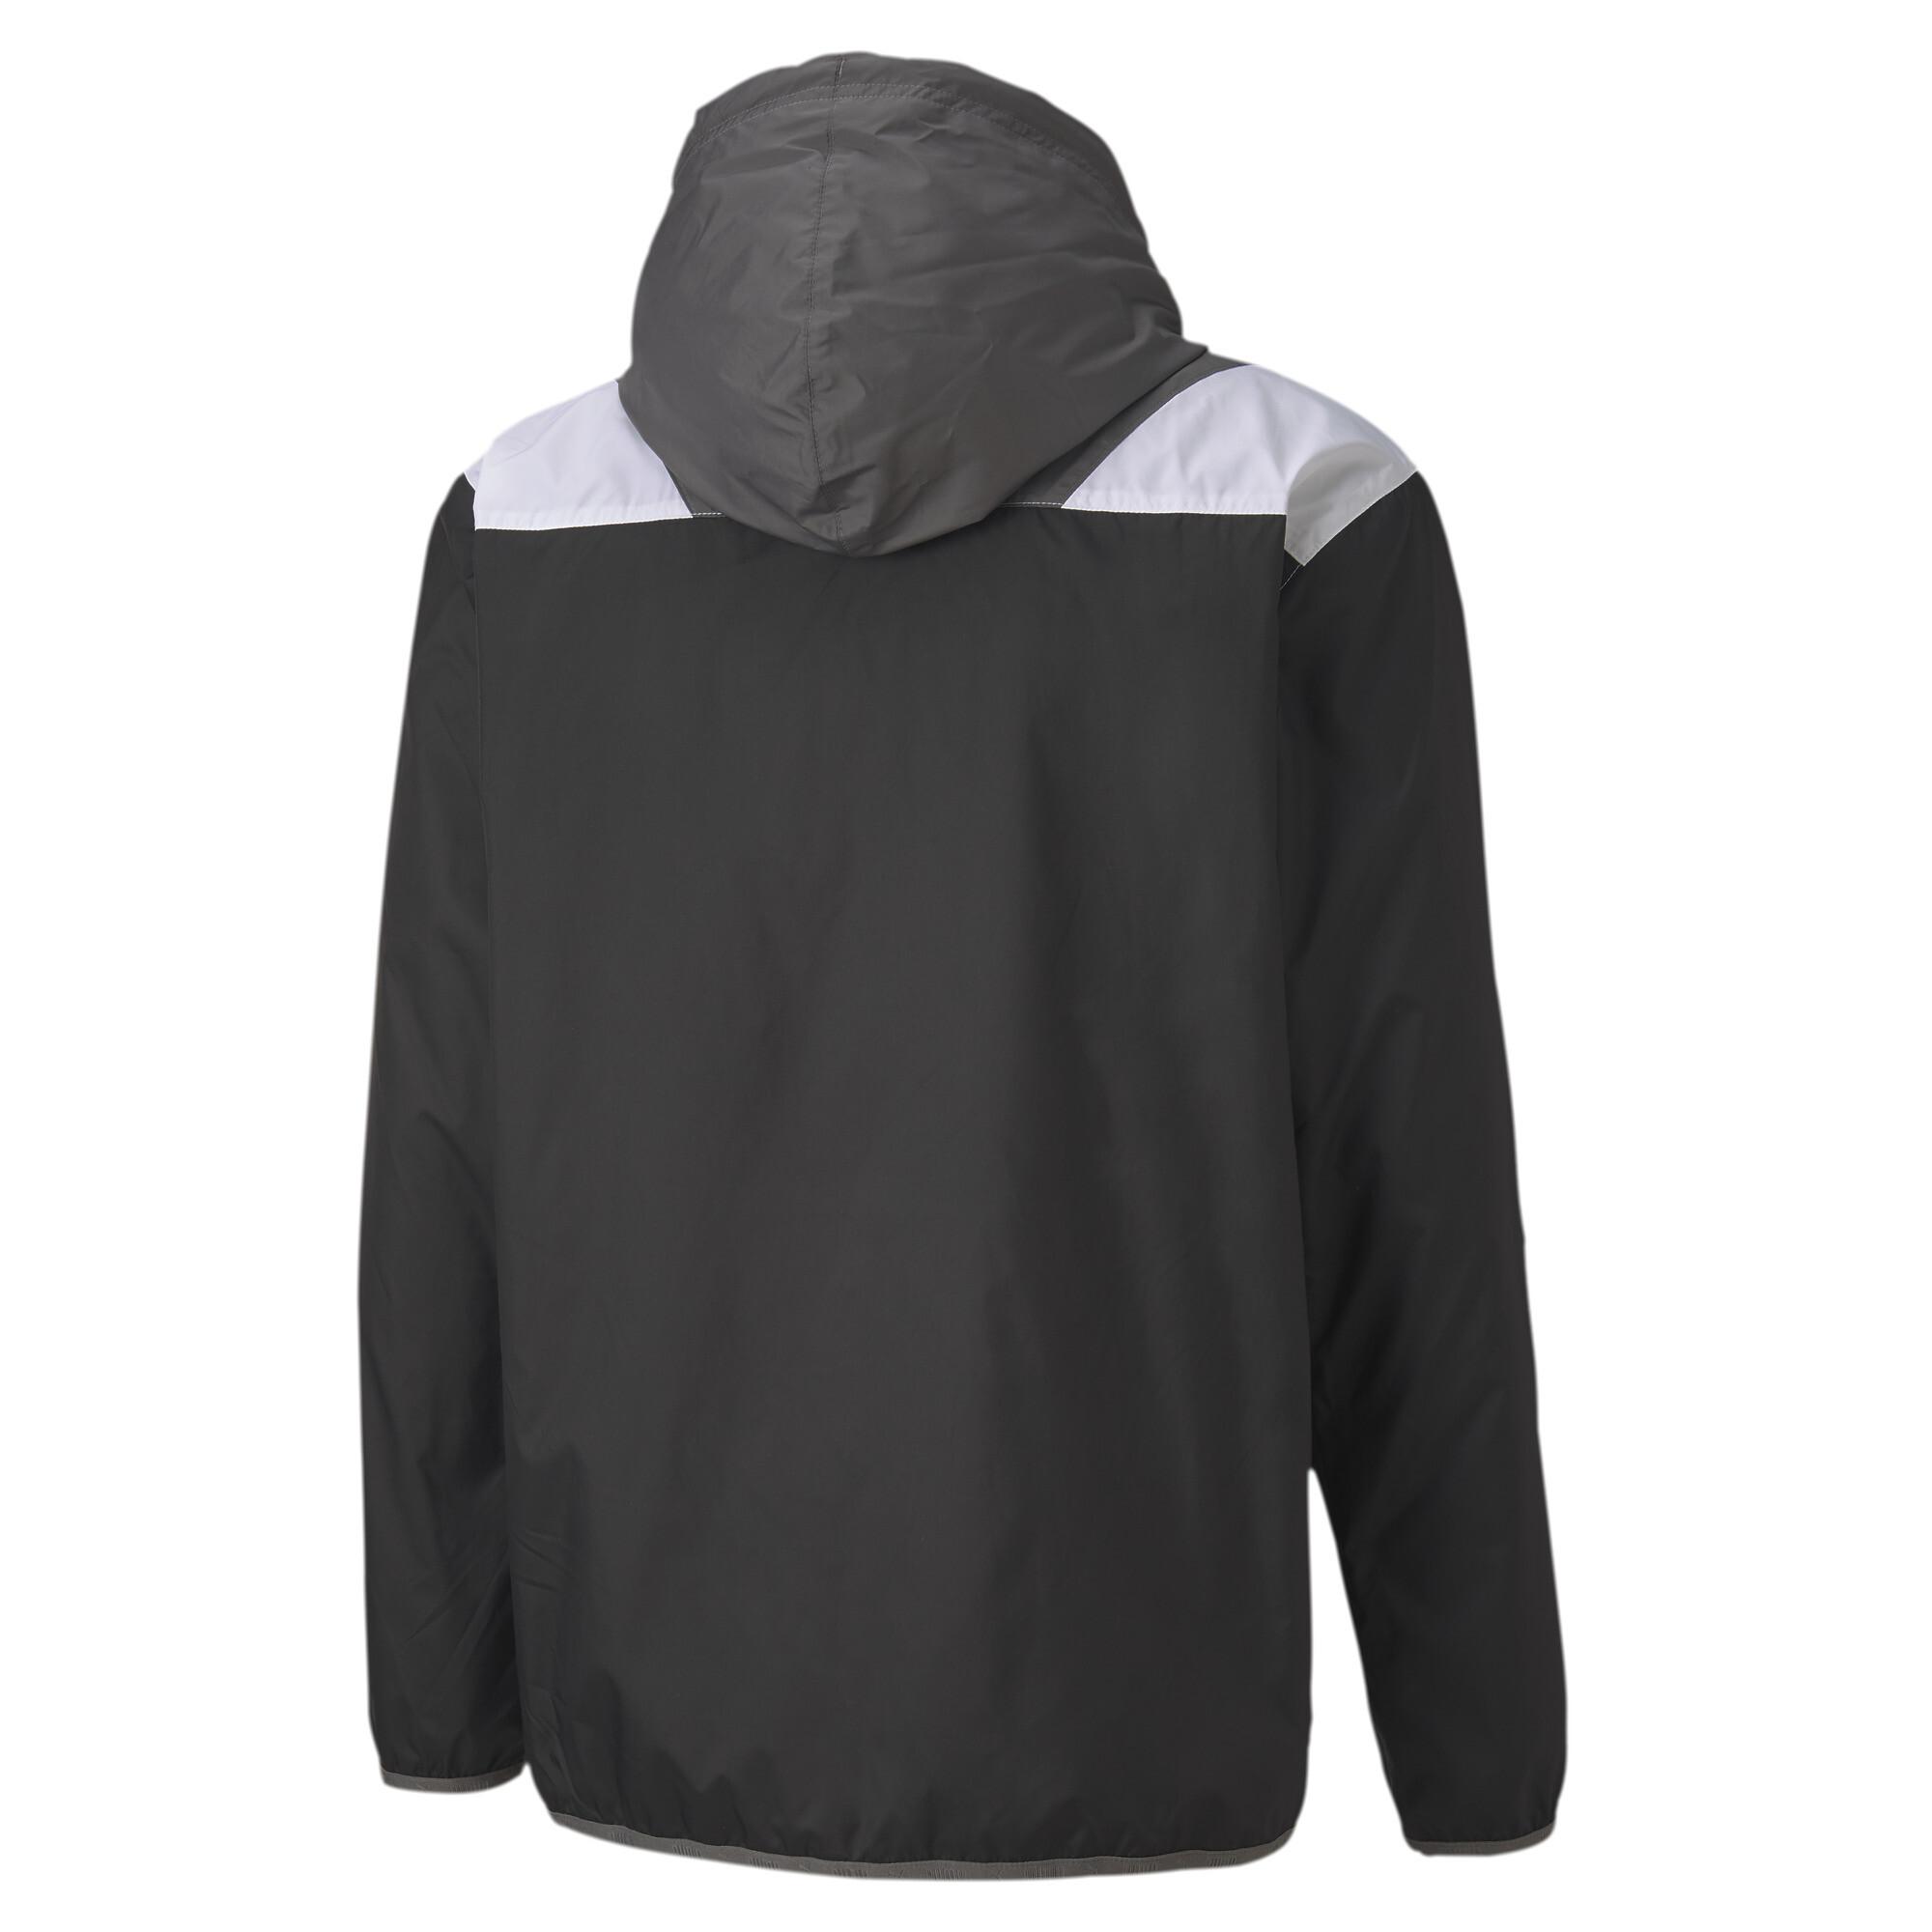 PUMA-Men-039-s-Reactive-Woven-Training-Jacket thumbnail 3